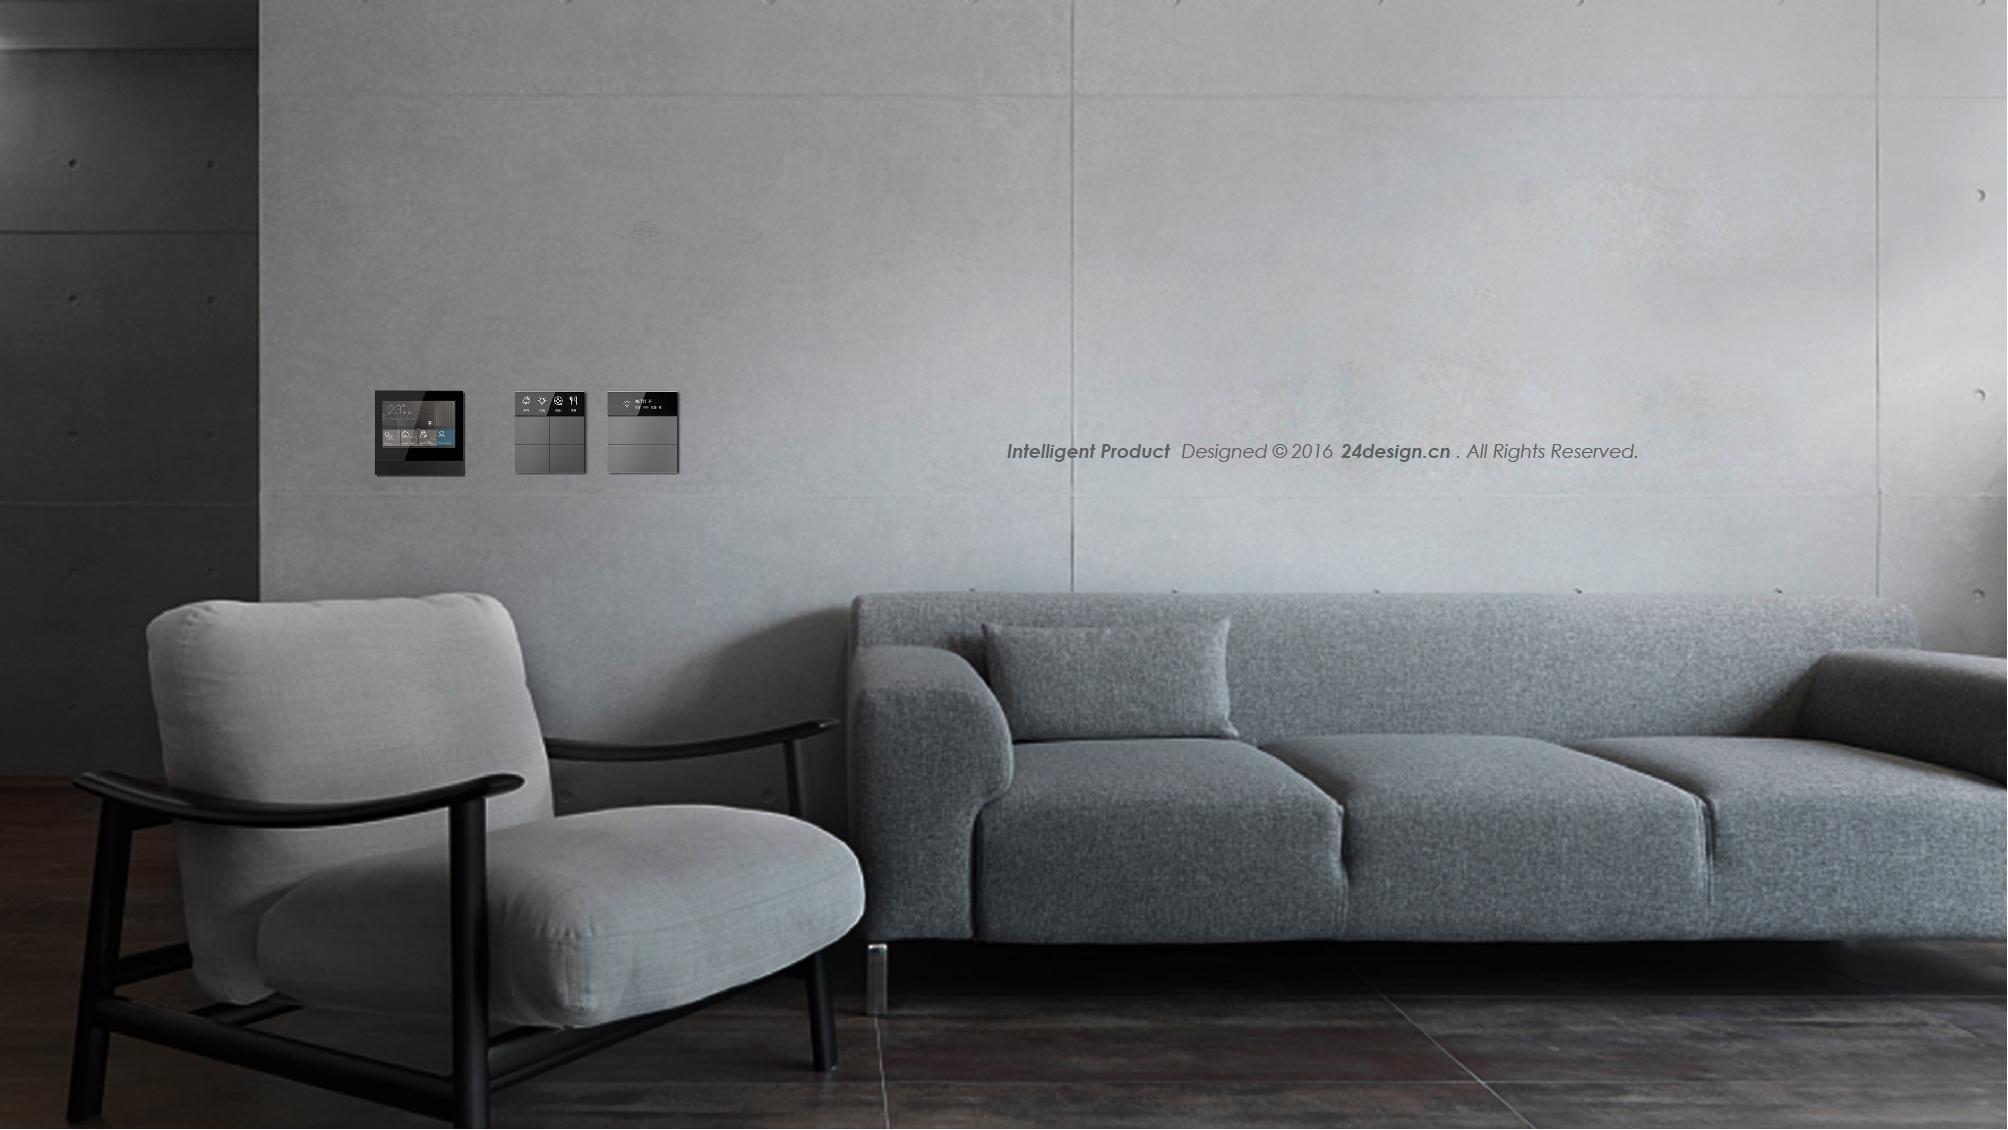 24design 智能家居网关设计 开关设计 深圳二十四设计图片